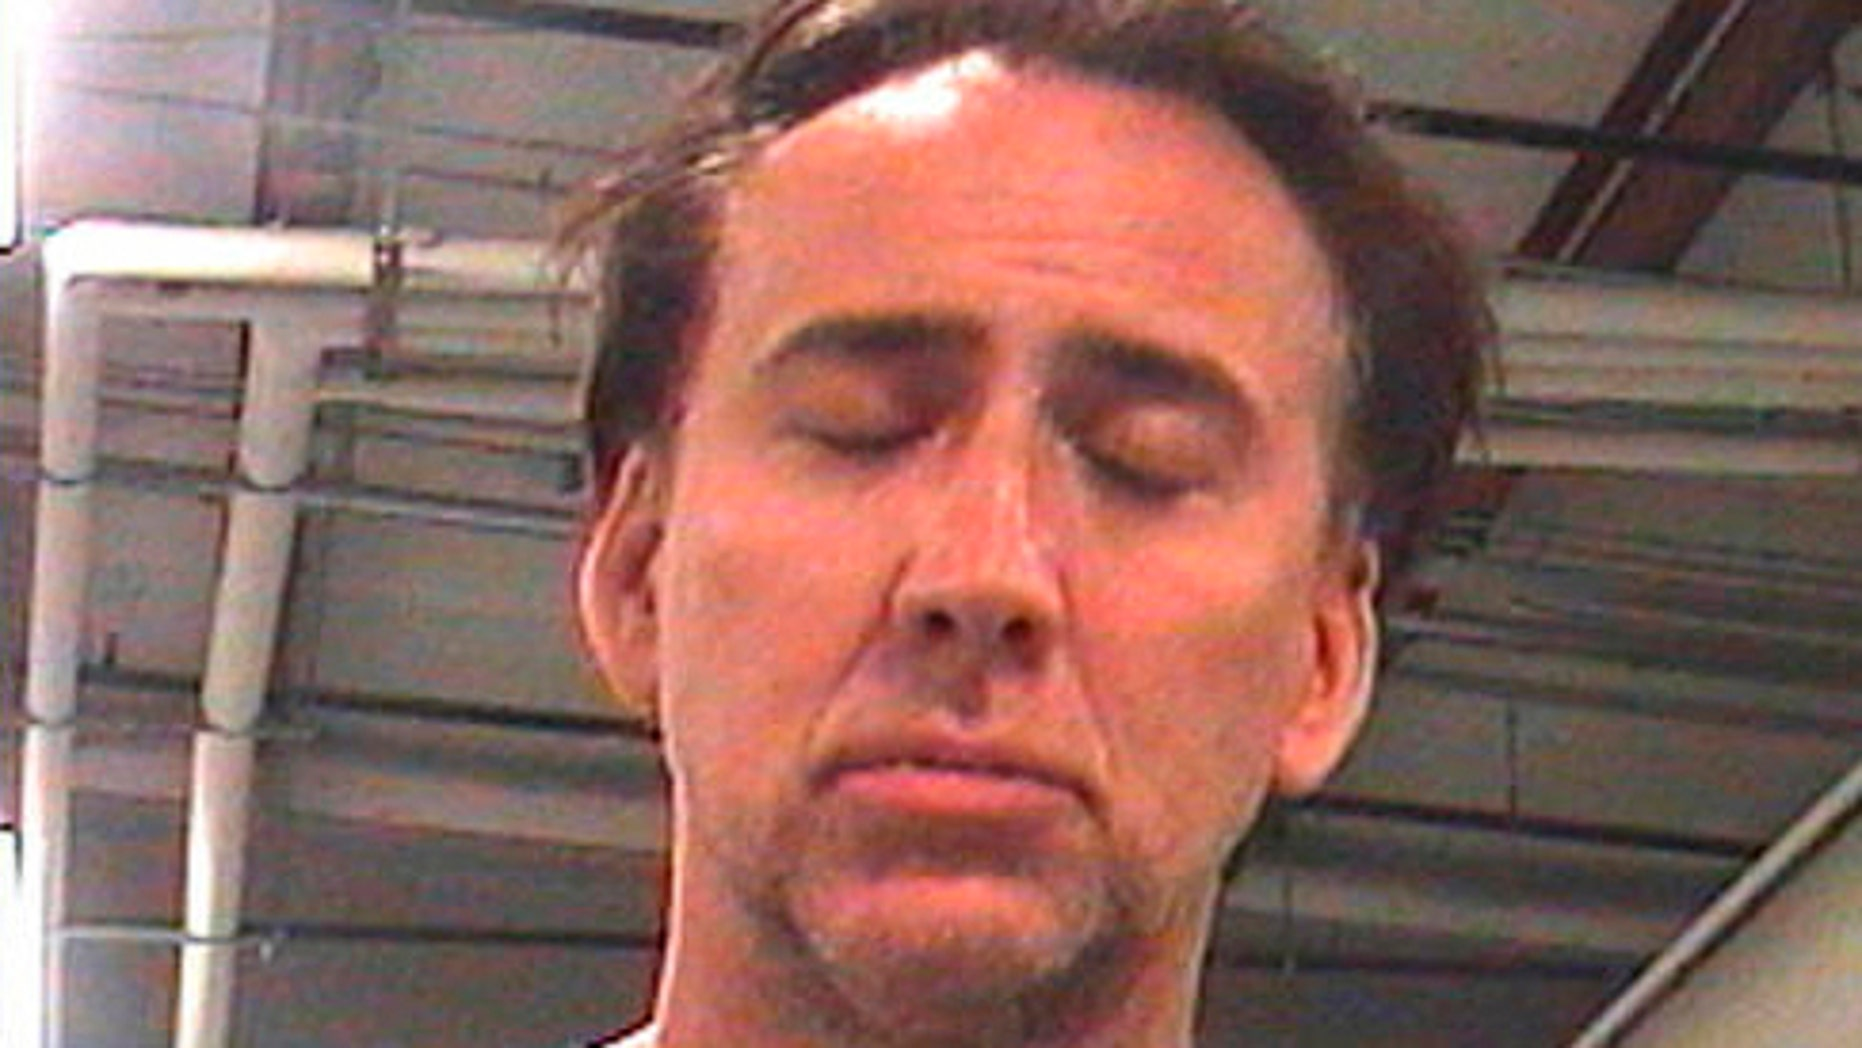 Actor Nicolas Cage's mugshot.